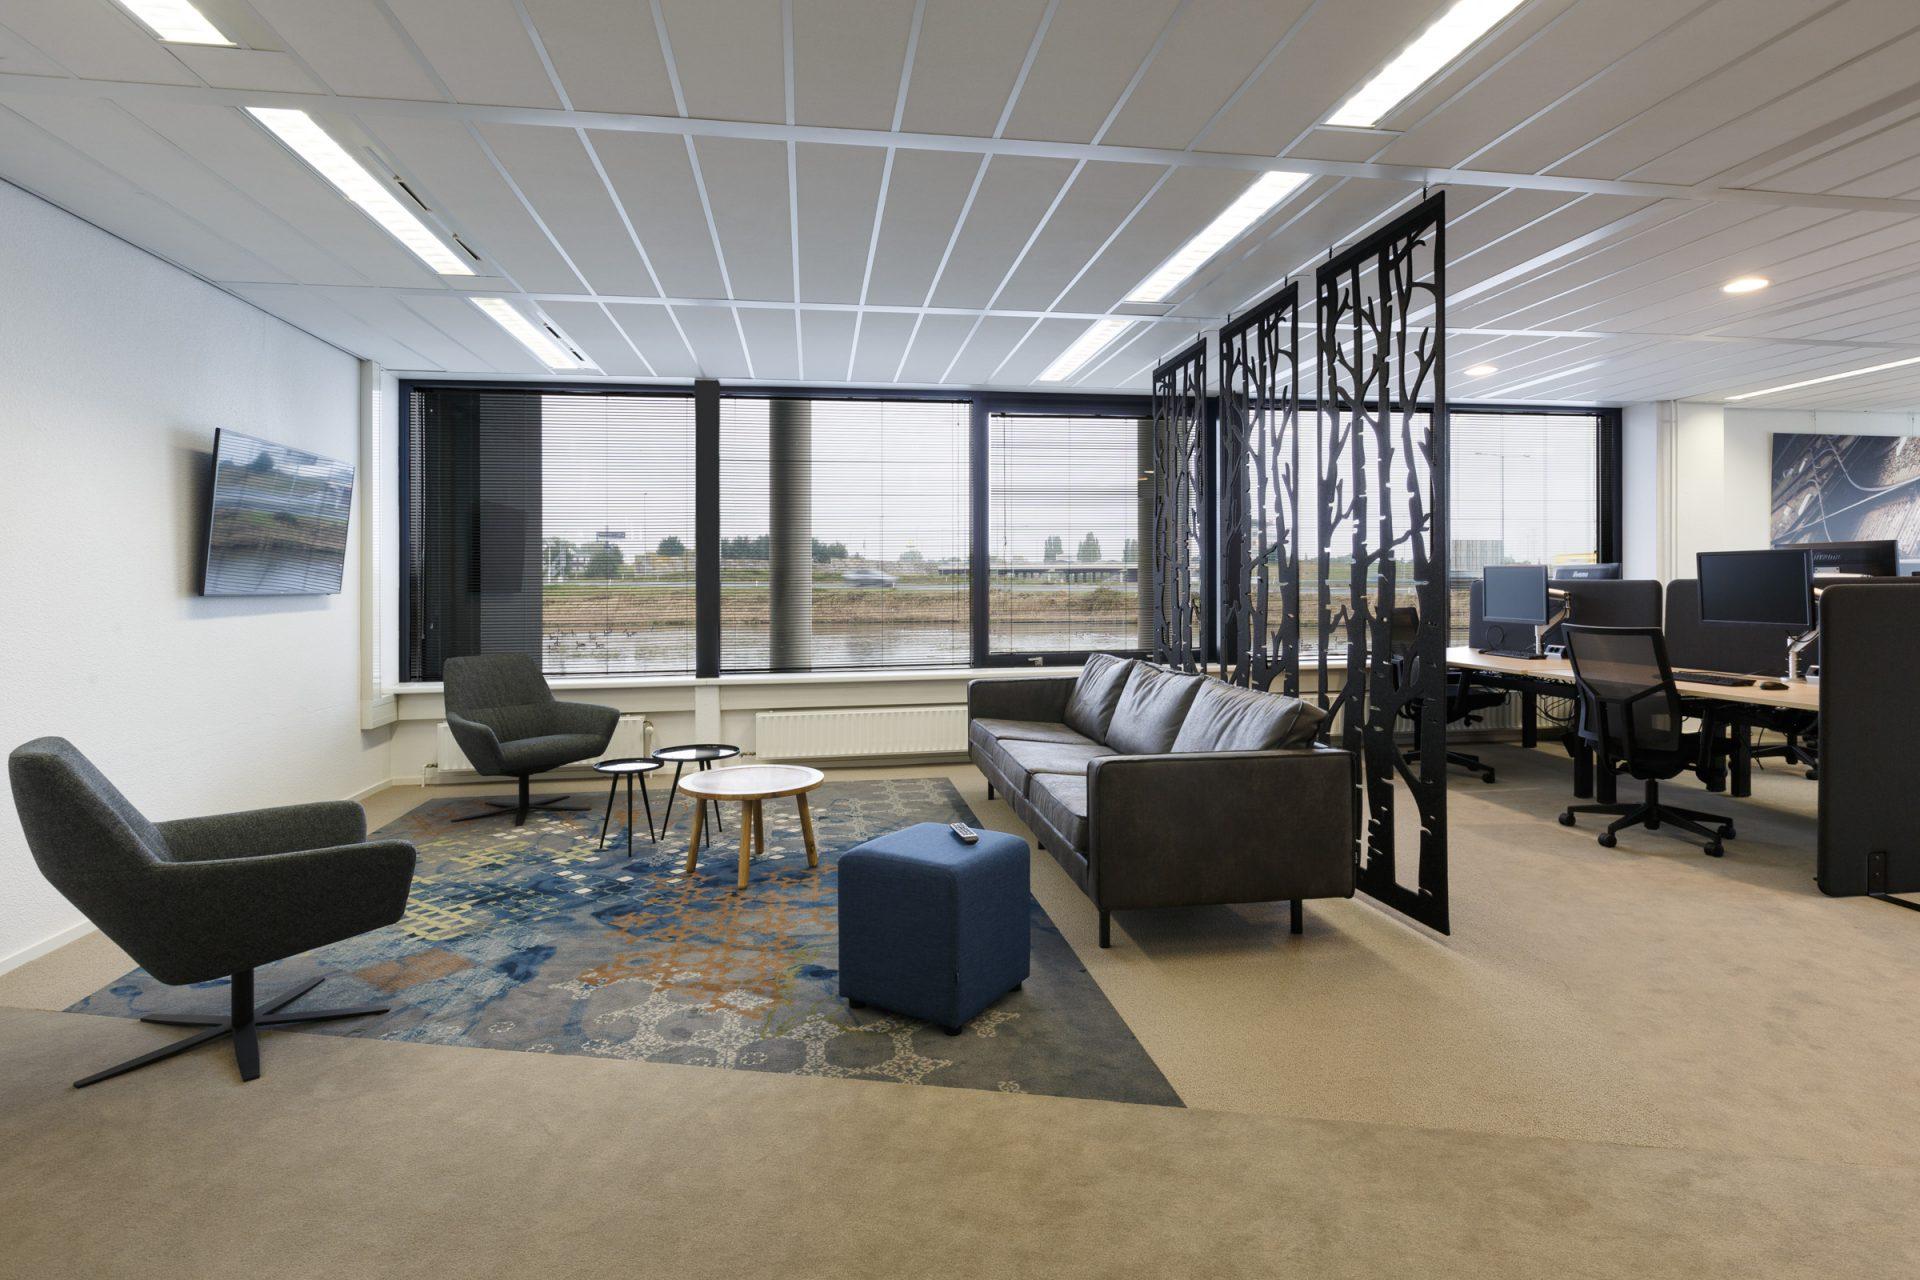 RubiX s-Hertogenbosch - Topperprojecten 1